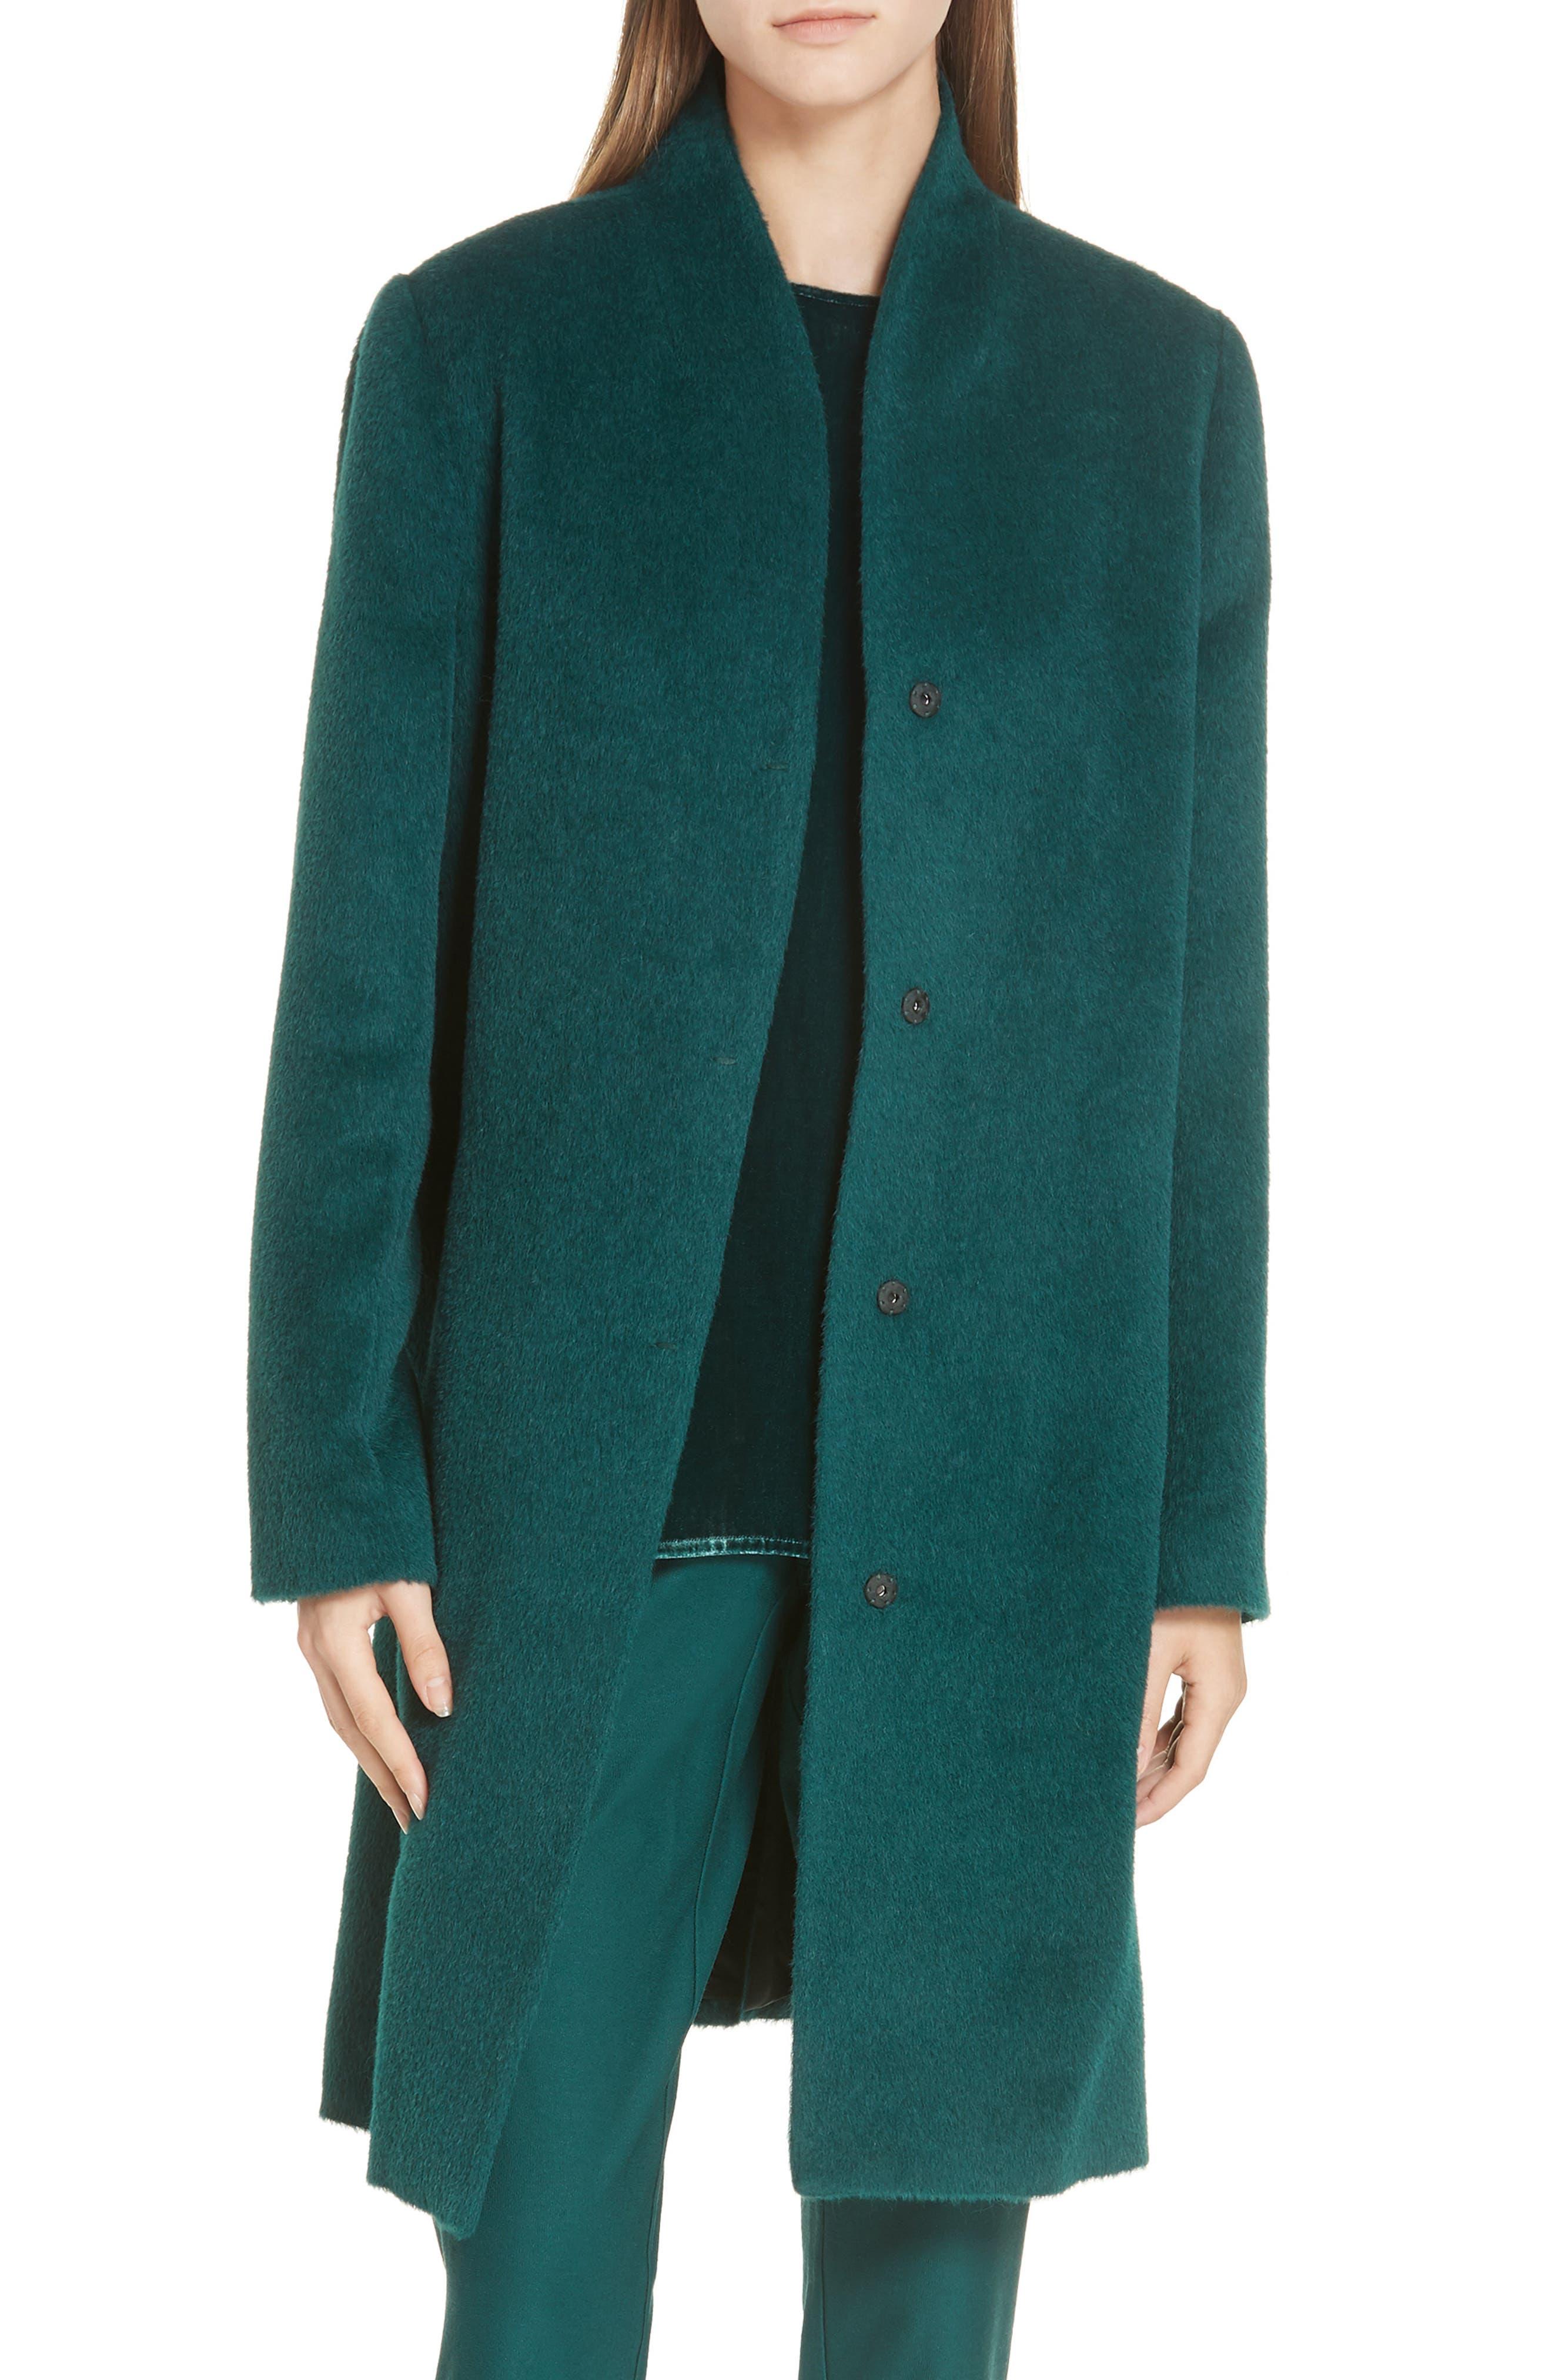 Suri Alpaca Blend Coat,                         Main,                         color, PINE